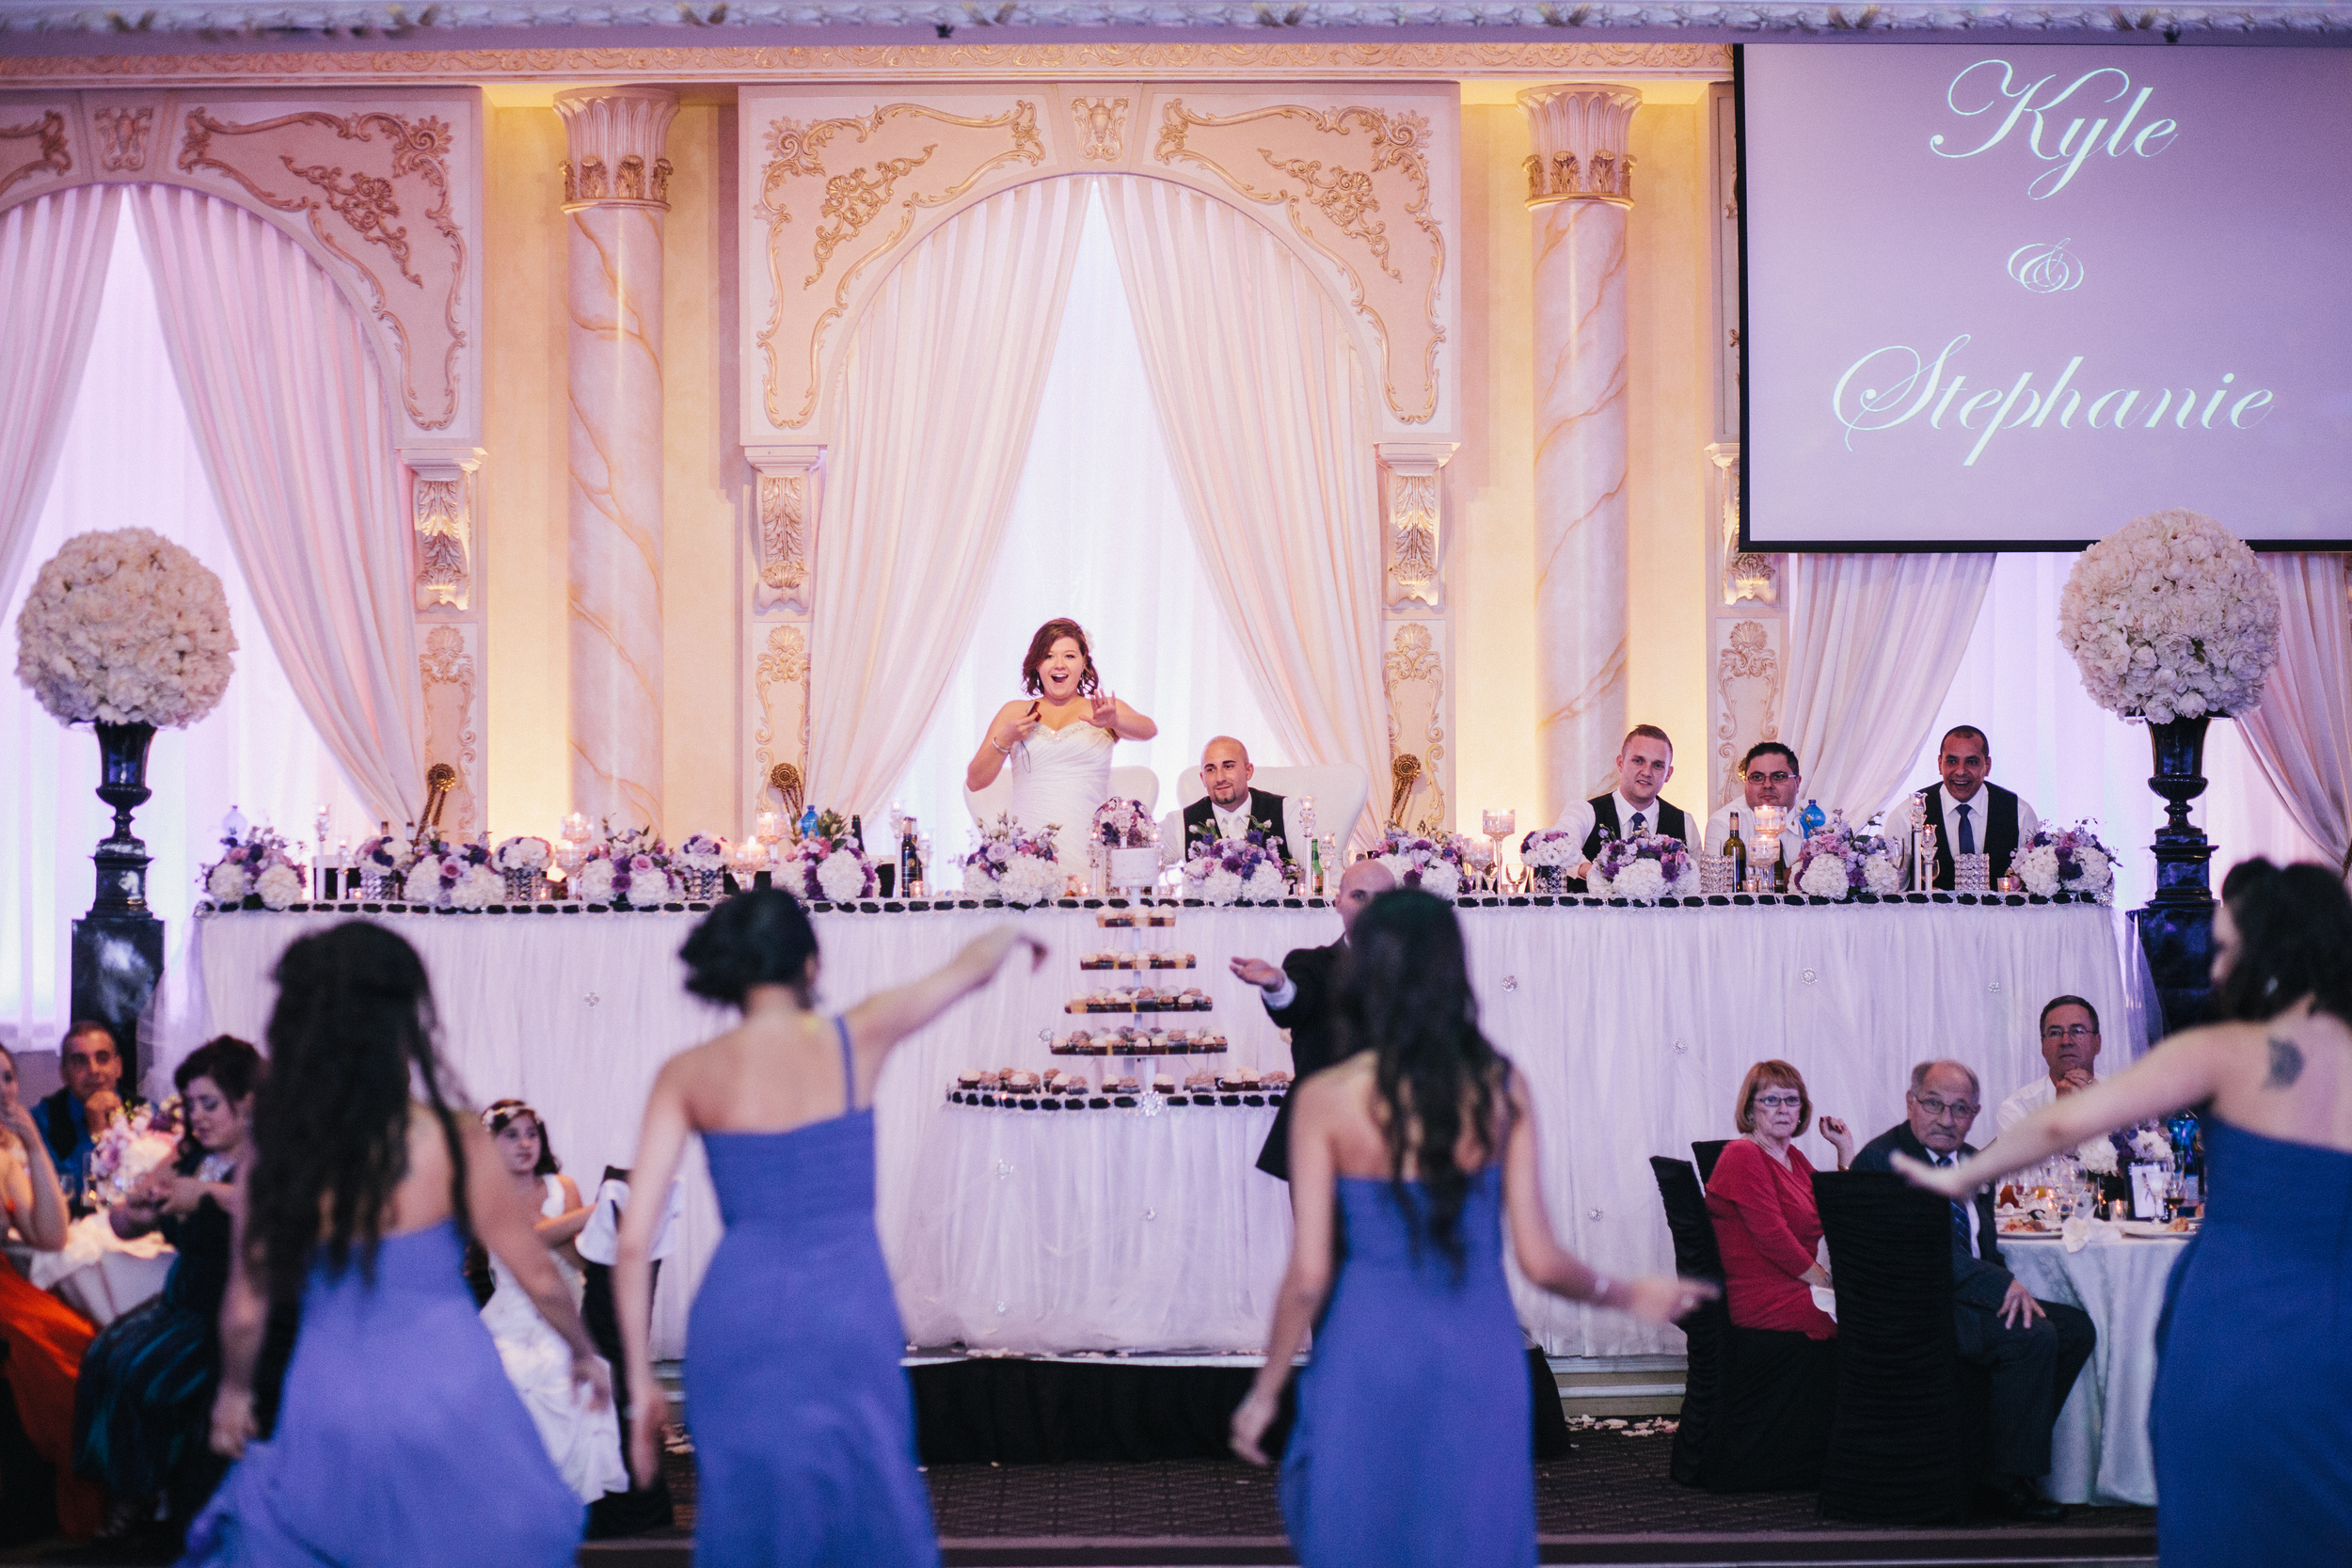 Stephanie-Kyle-paradise-banquet-hall-michael-rousseau-photography-best-toronto-wedding-photographer-documentary-wedding045.JPG